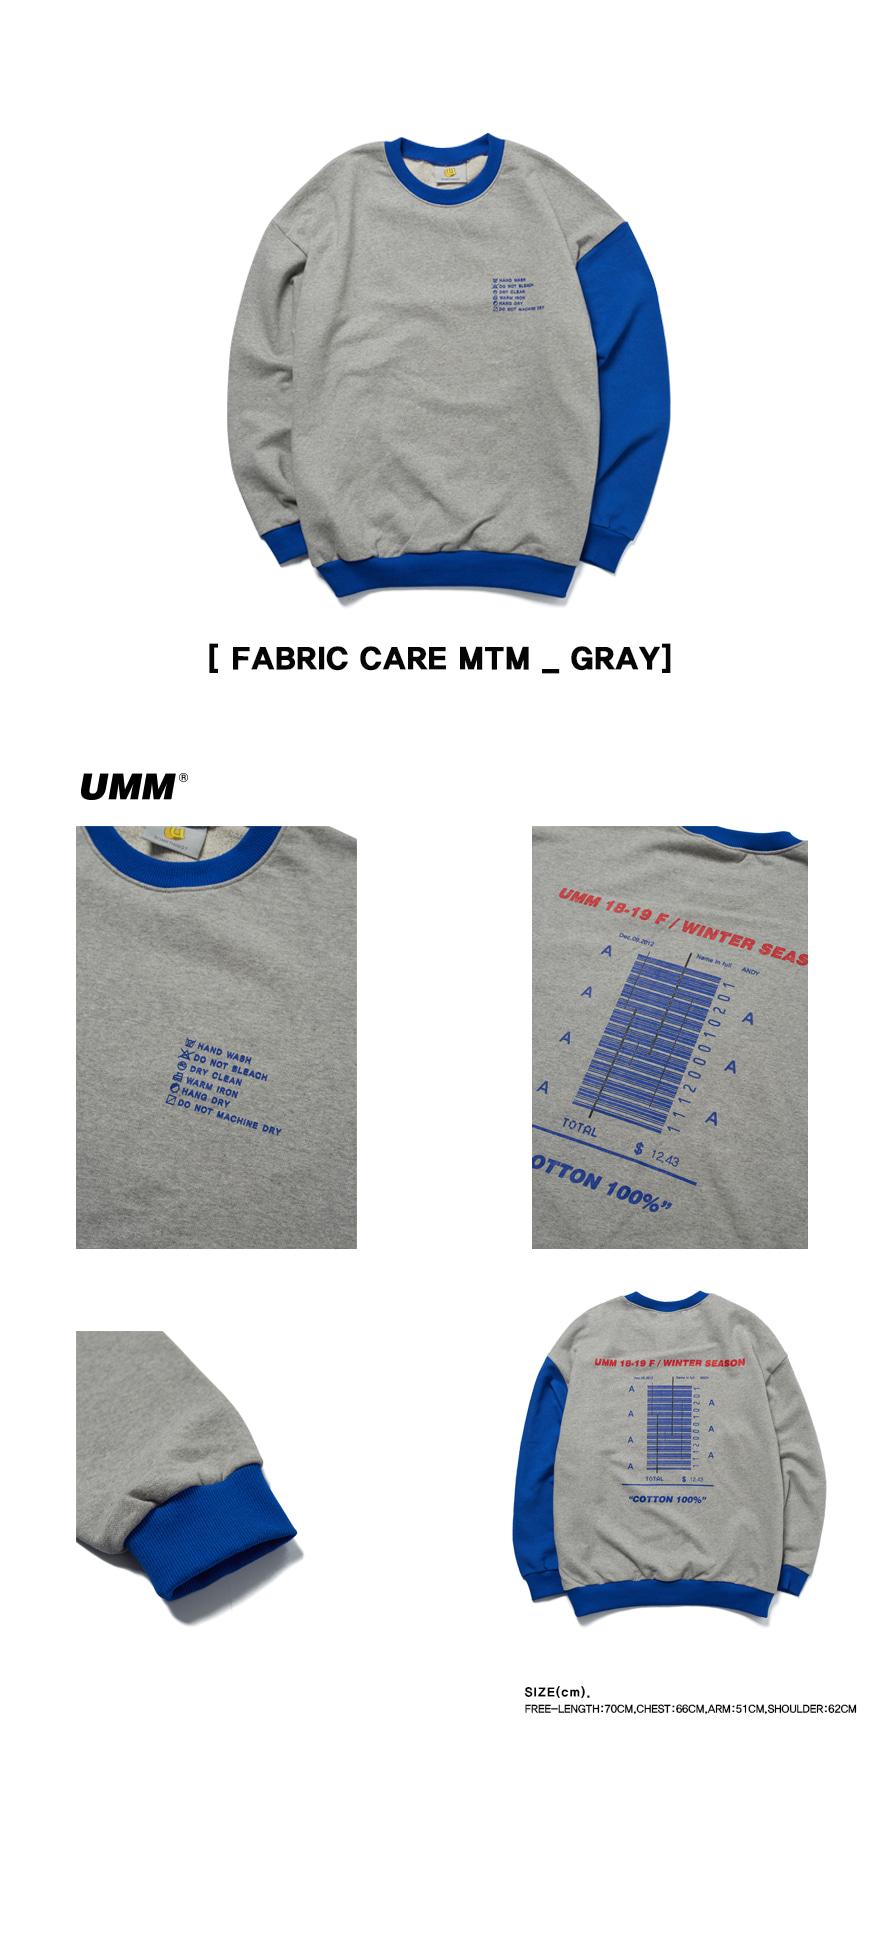 FABRIC-CARE-MTM-_-GRAY.jpg